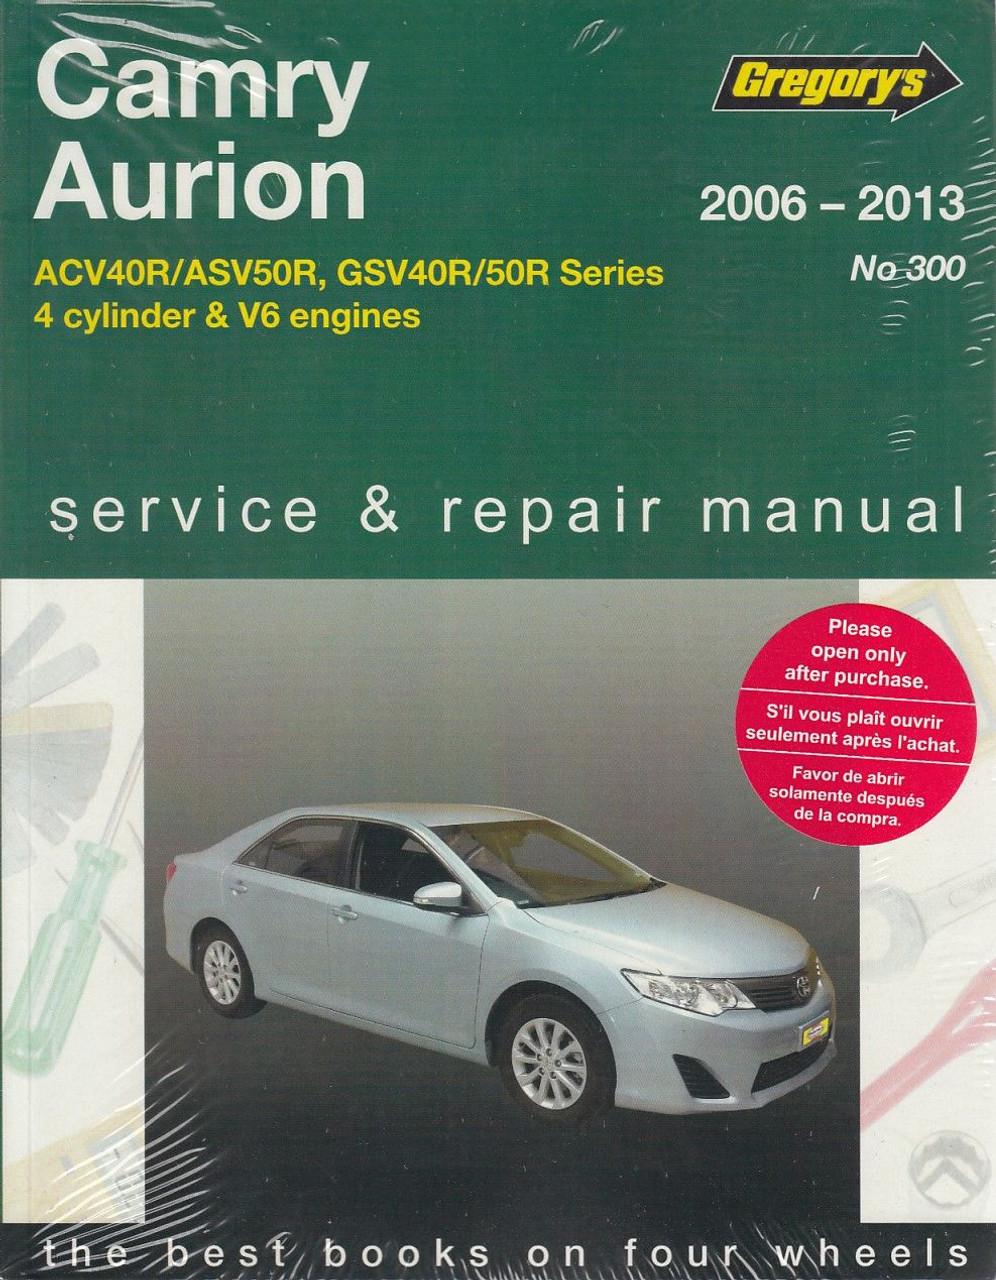 Toyota Aurion Wiring Diagram Manual Worksheet And 1988 Camry Radio 2 4 5 Litre 3 V6 2006 2013 Rh Automotobookshop Com Au Tundra 1978 Pickup